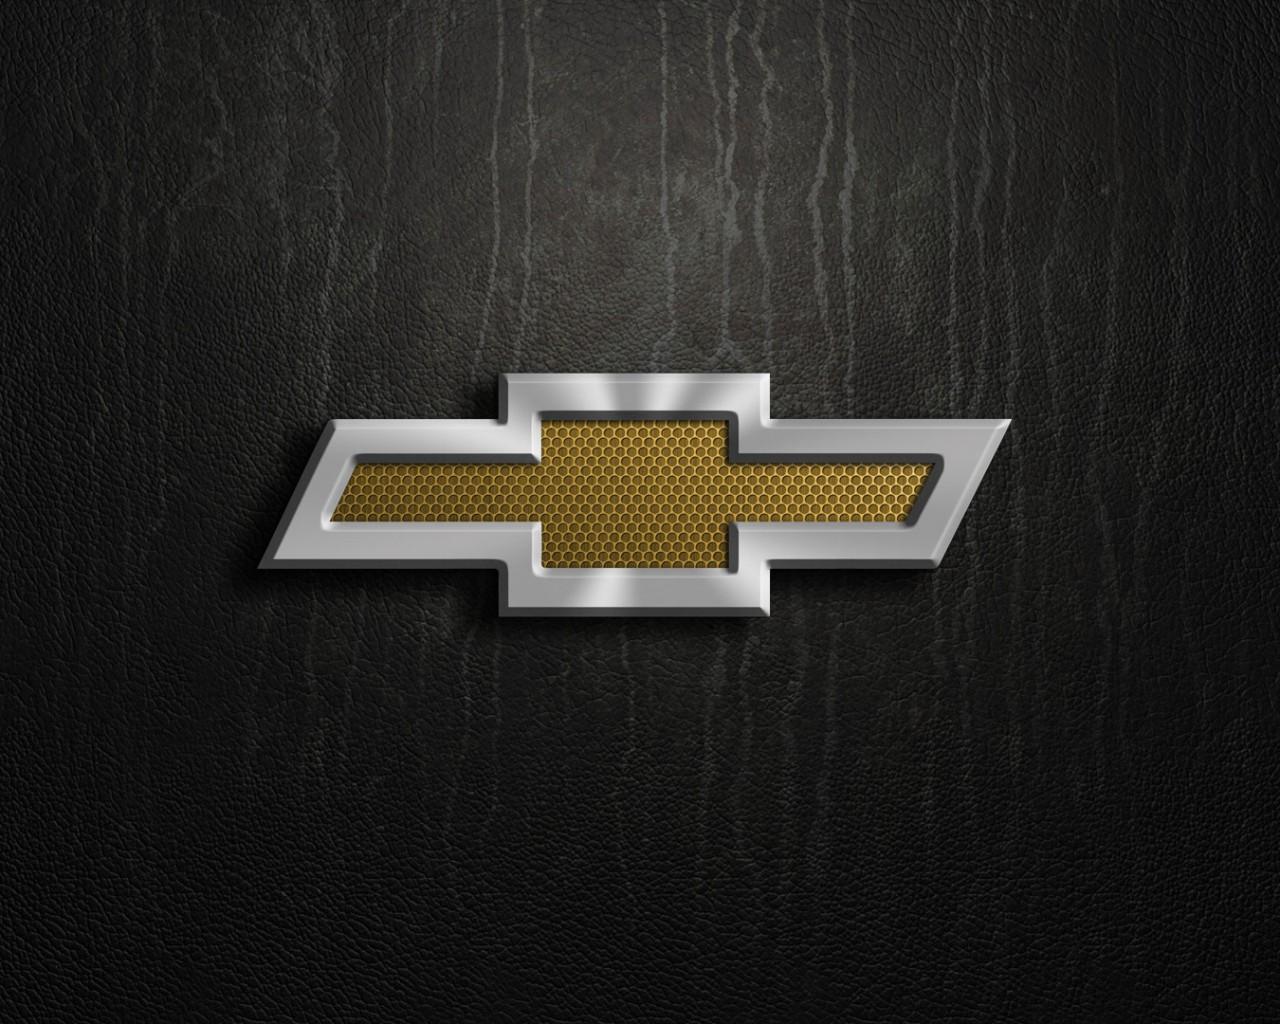 chevy logo wallpaper - Google Search | Vehicle | Pinterest | Logos